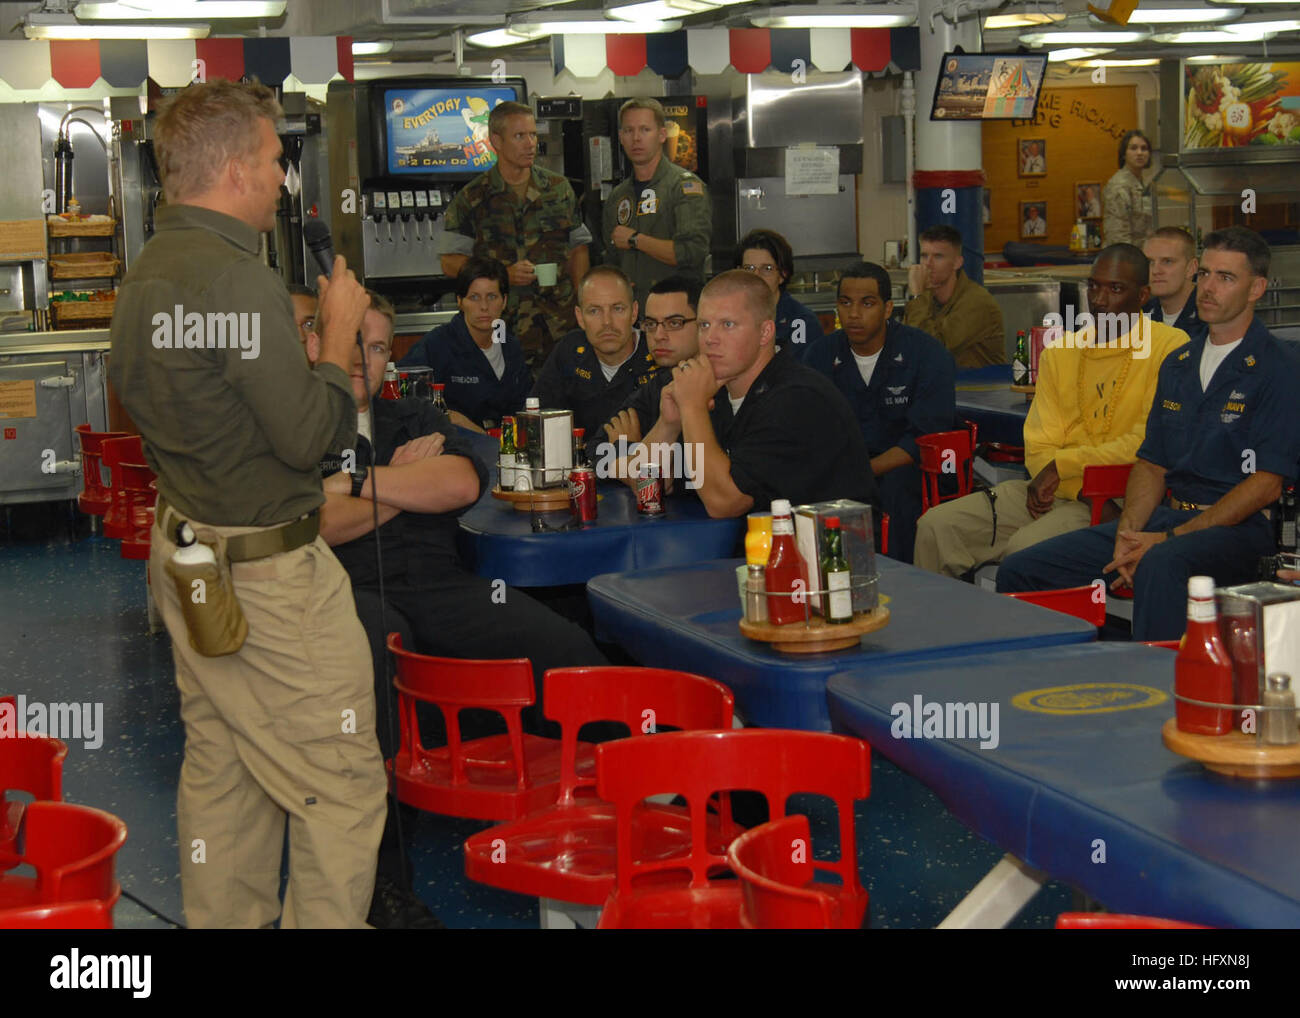 090720-N-0515W-012 PACIFIC OCEAN (July 20, 2009) Stuntman and motocross racer Mike ÒMouseÓ McCoy speaks - Stock Image